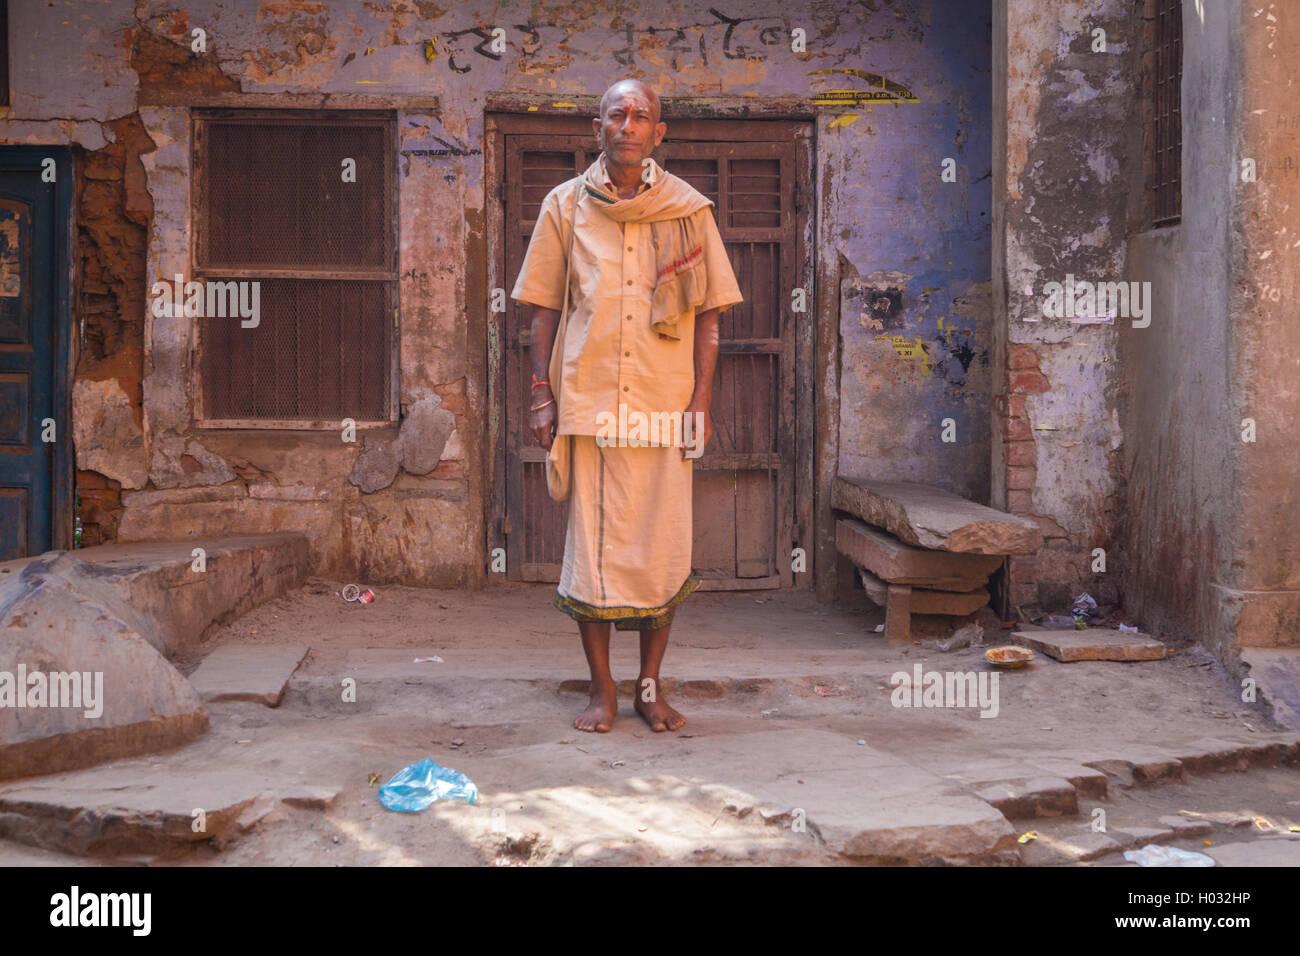 f7cca193f2 VARANASI, INDIA - 21 FEBRUARY 2015: Pilgrim dressed in lungi, shirt and  scarf